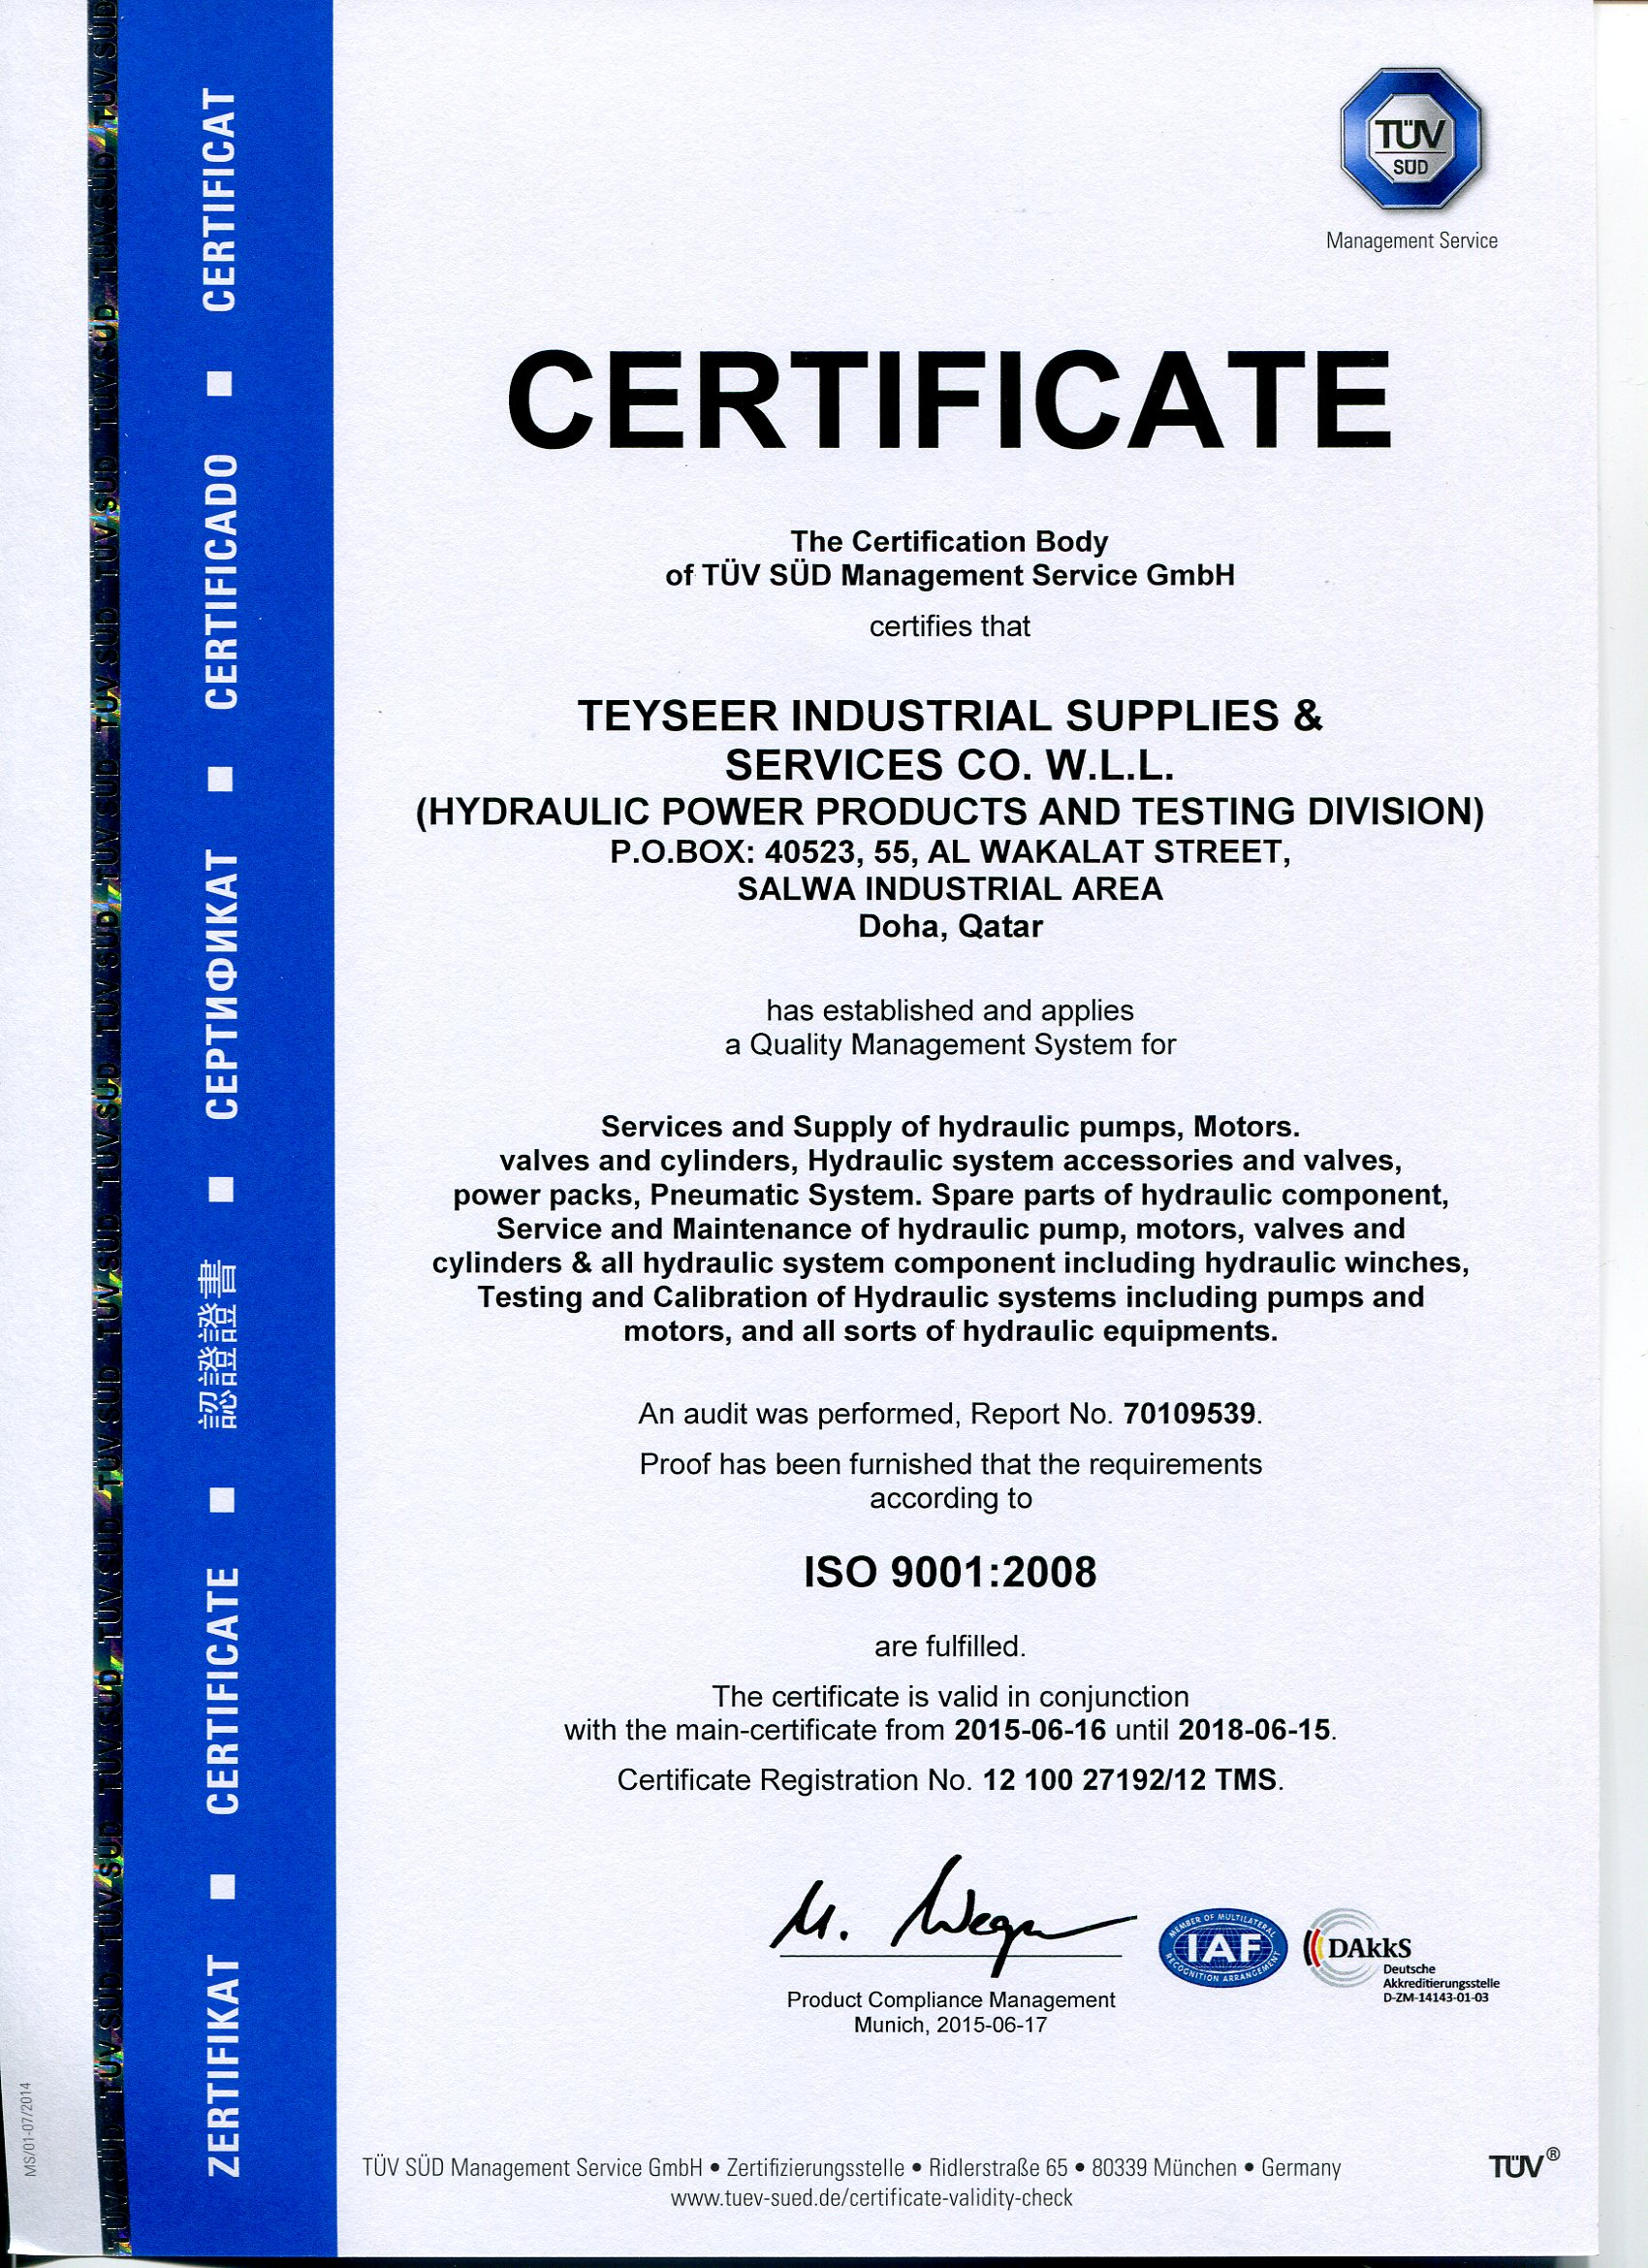 Teyseer Industrial Supplies & Services Co  W L L